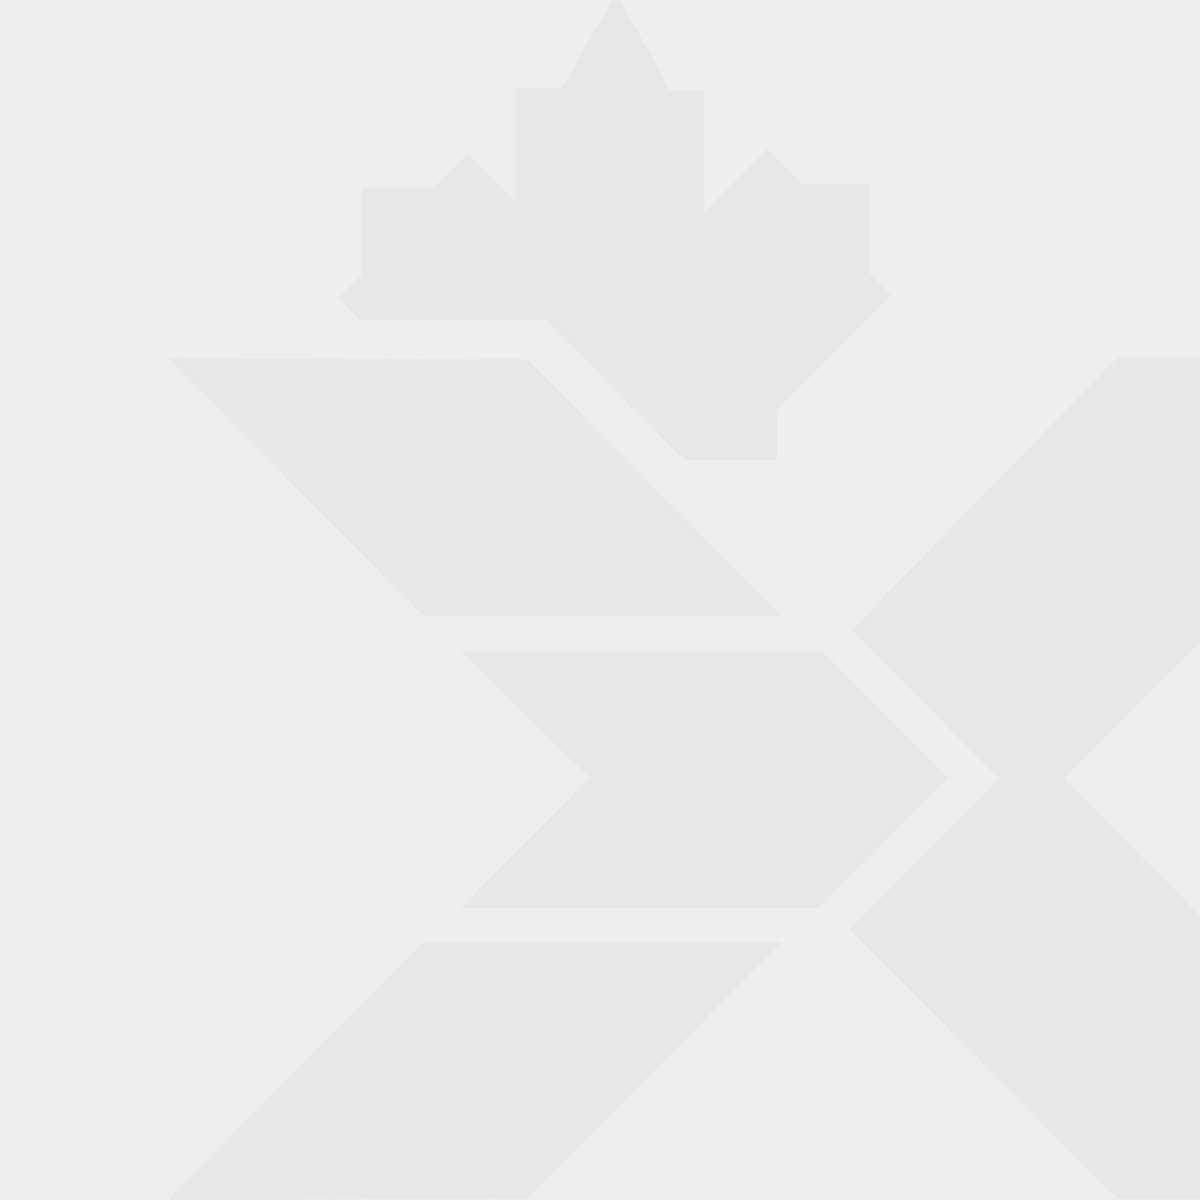 CADTC KINGSTON - H2X-DRY® SHORTS